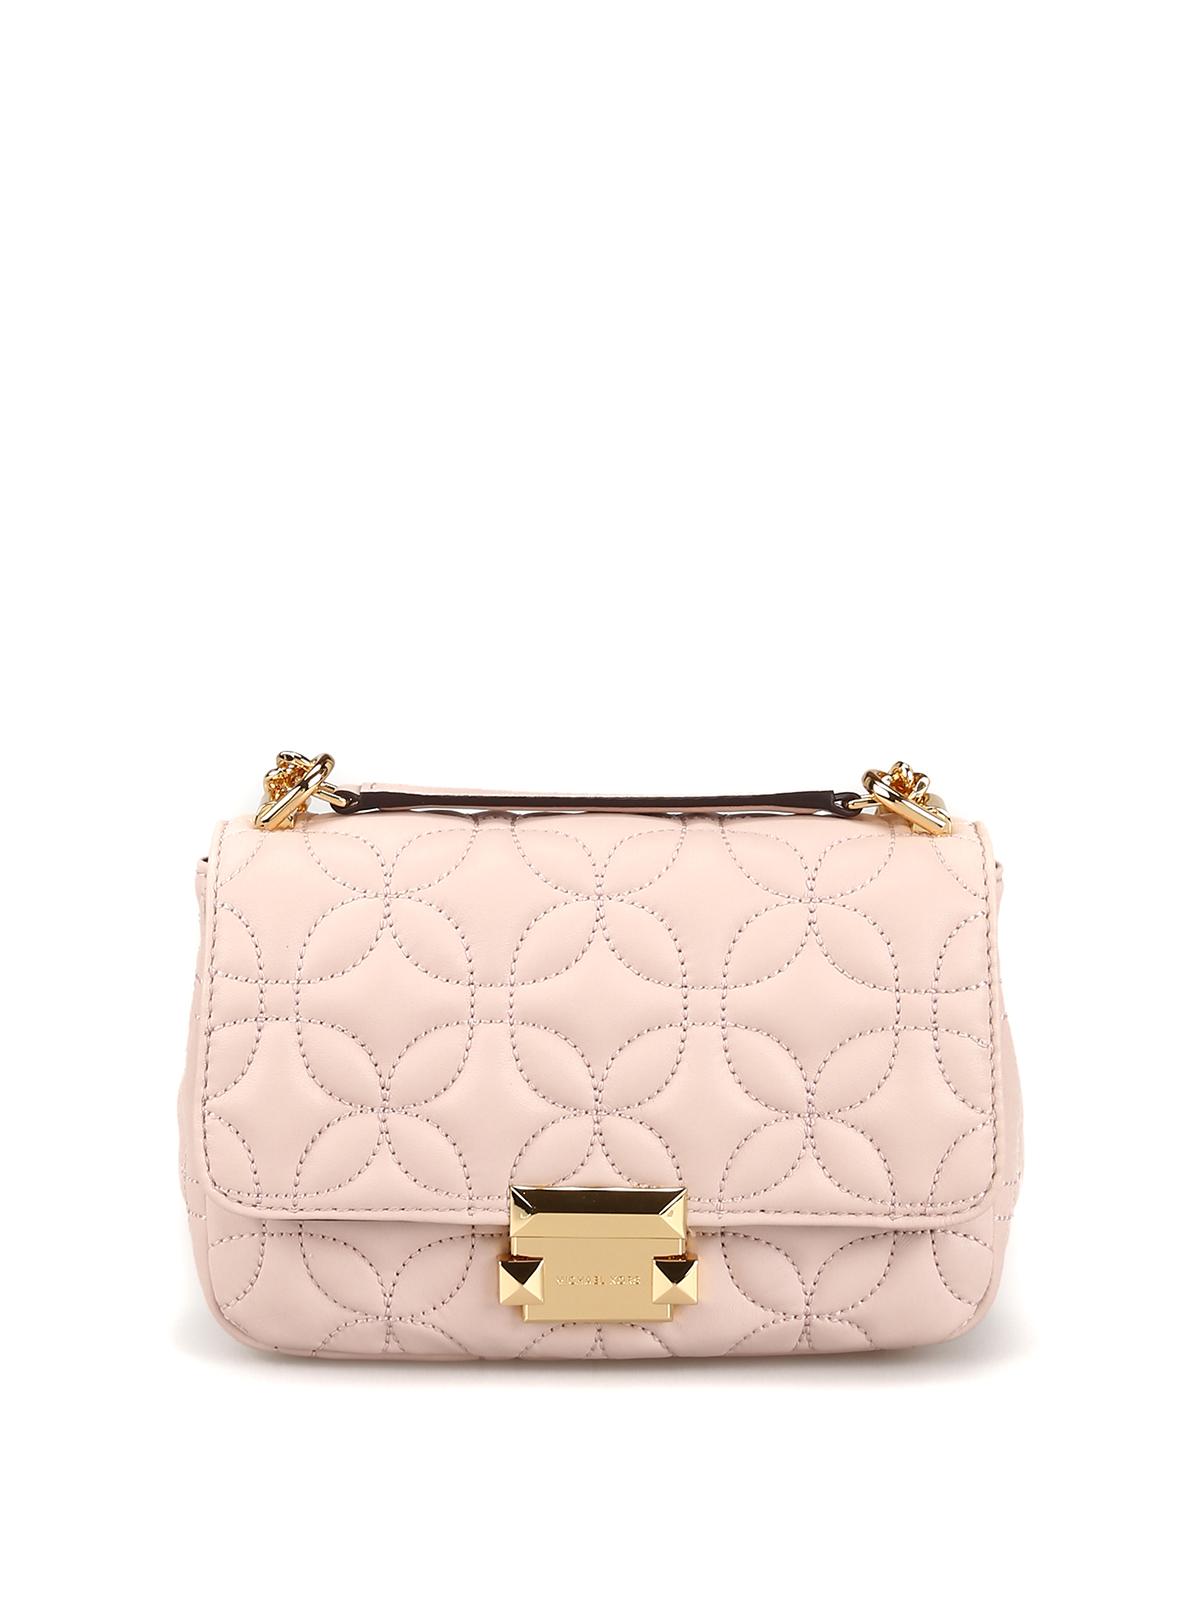 720c1437c66394 MICHAEL KORS: shoulder bags - Sloan soft pink matelassé leather small bag